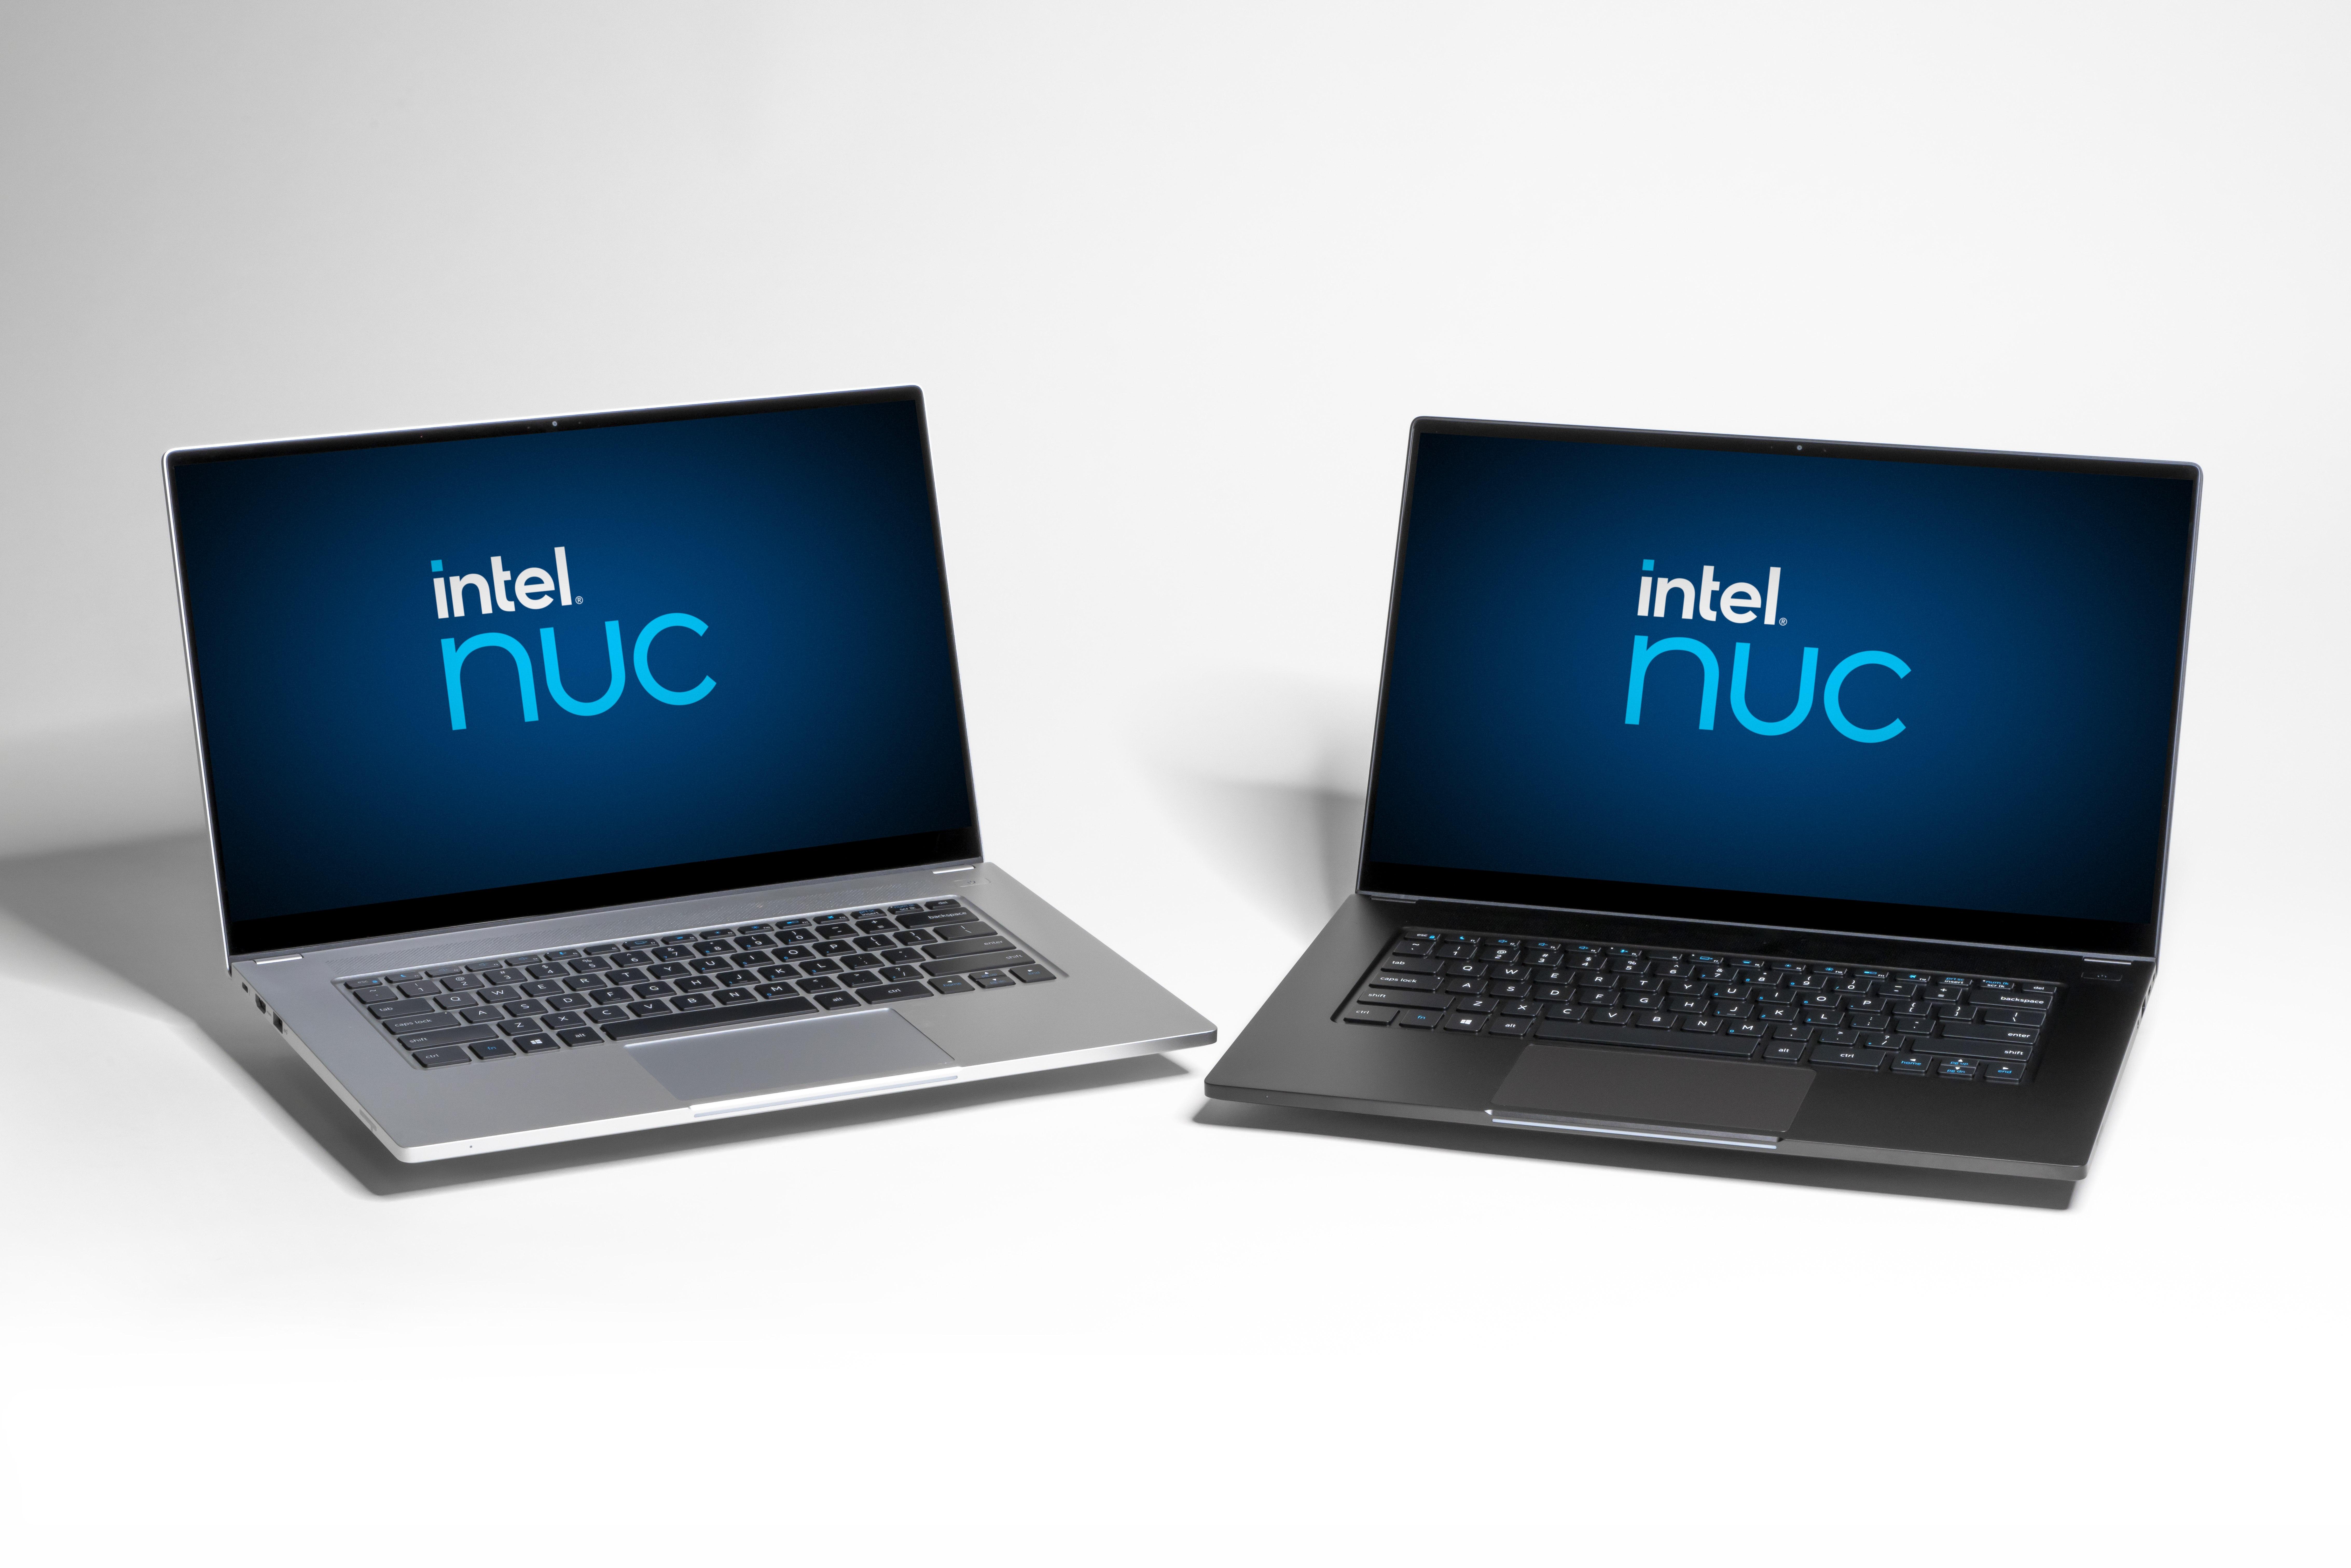 Intel-NUC-M15-laptop-kit-2